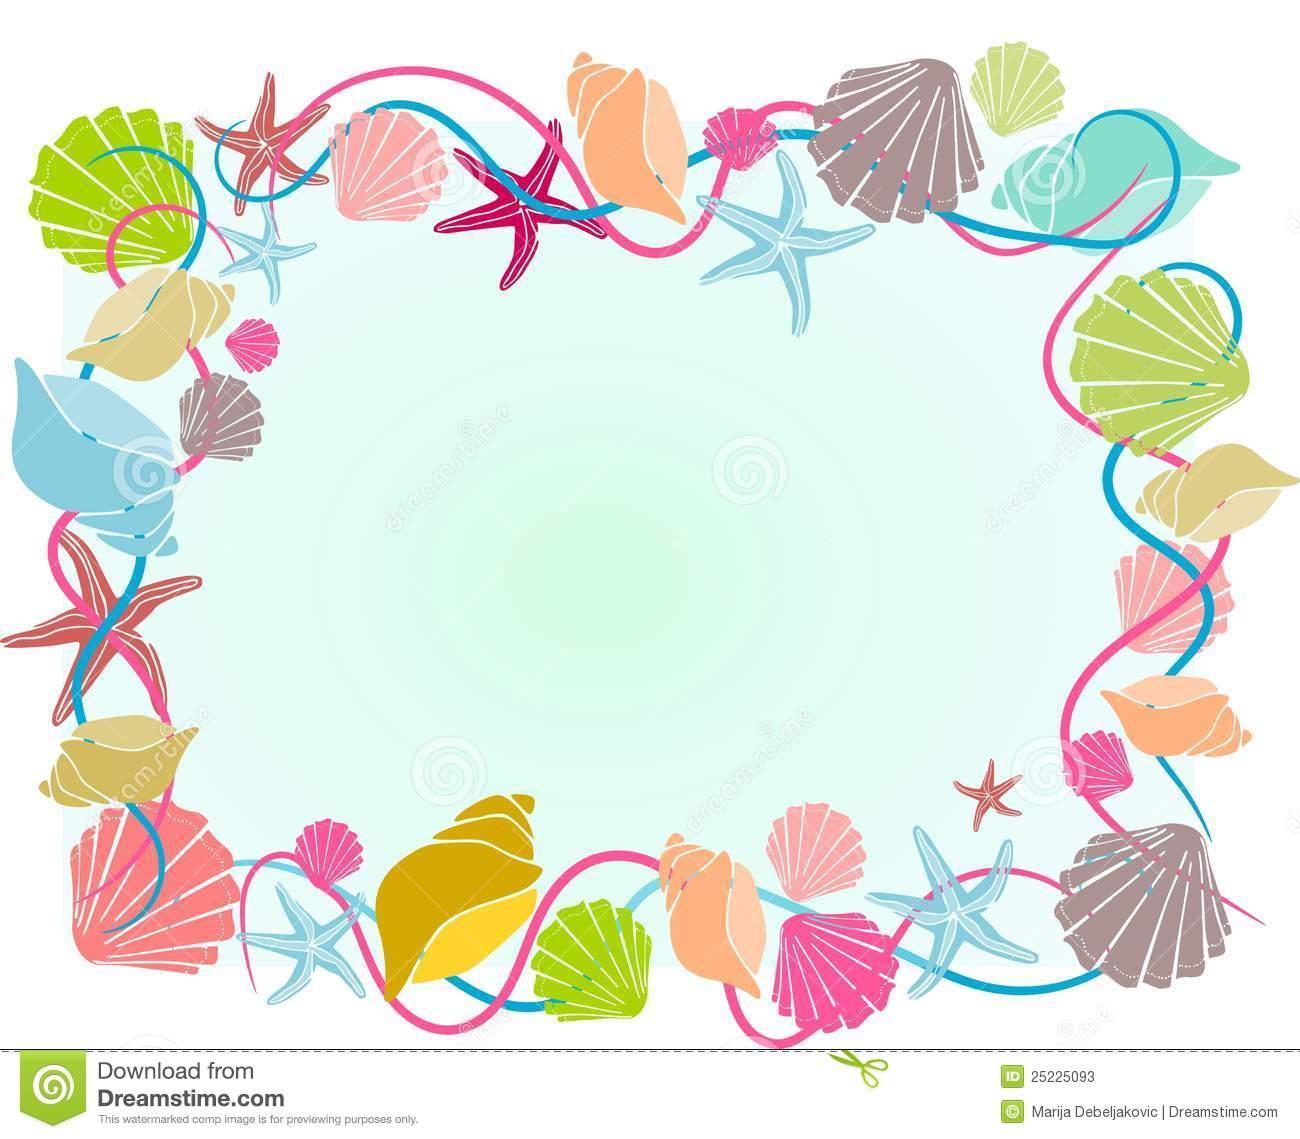 Ocean clipart frame. Border free download best